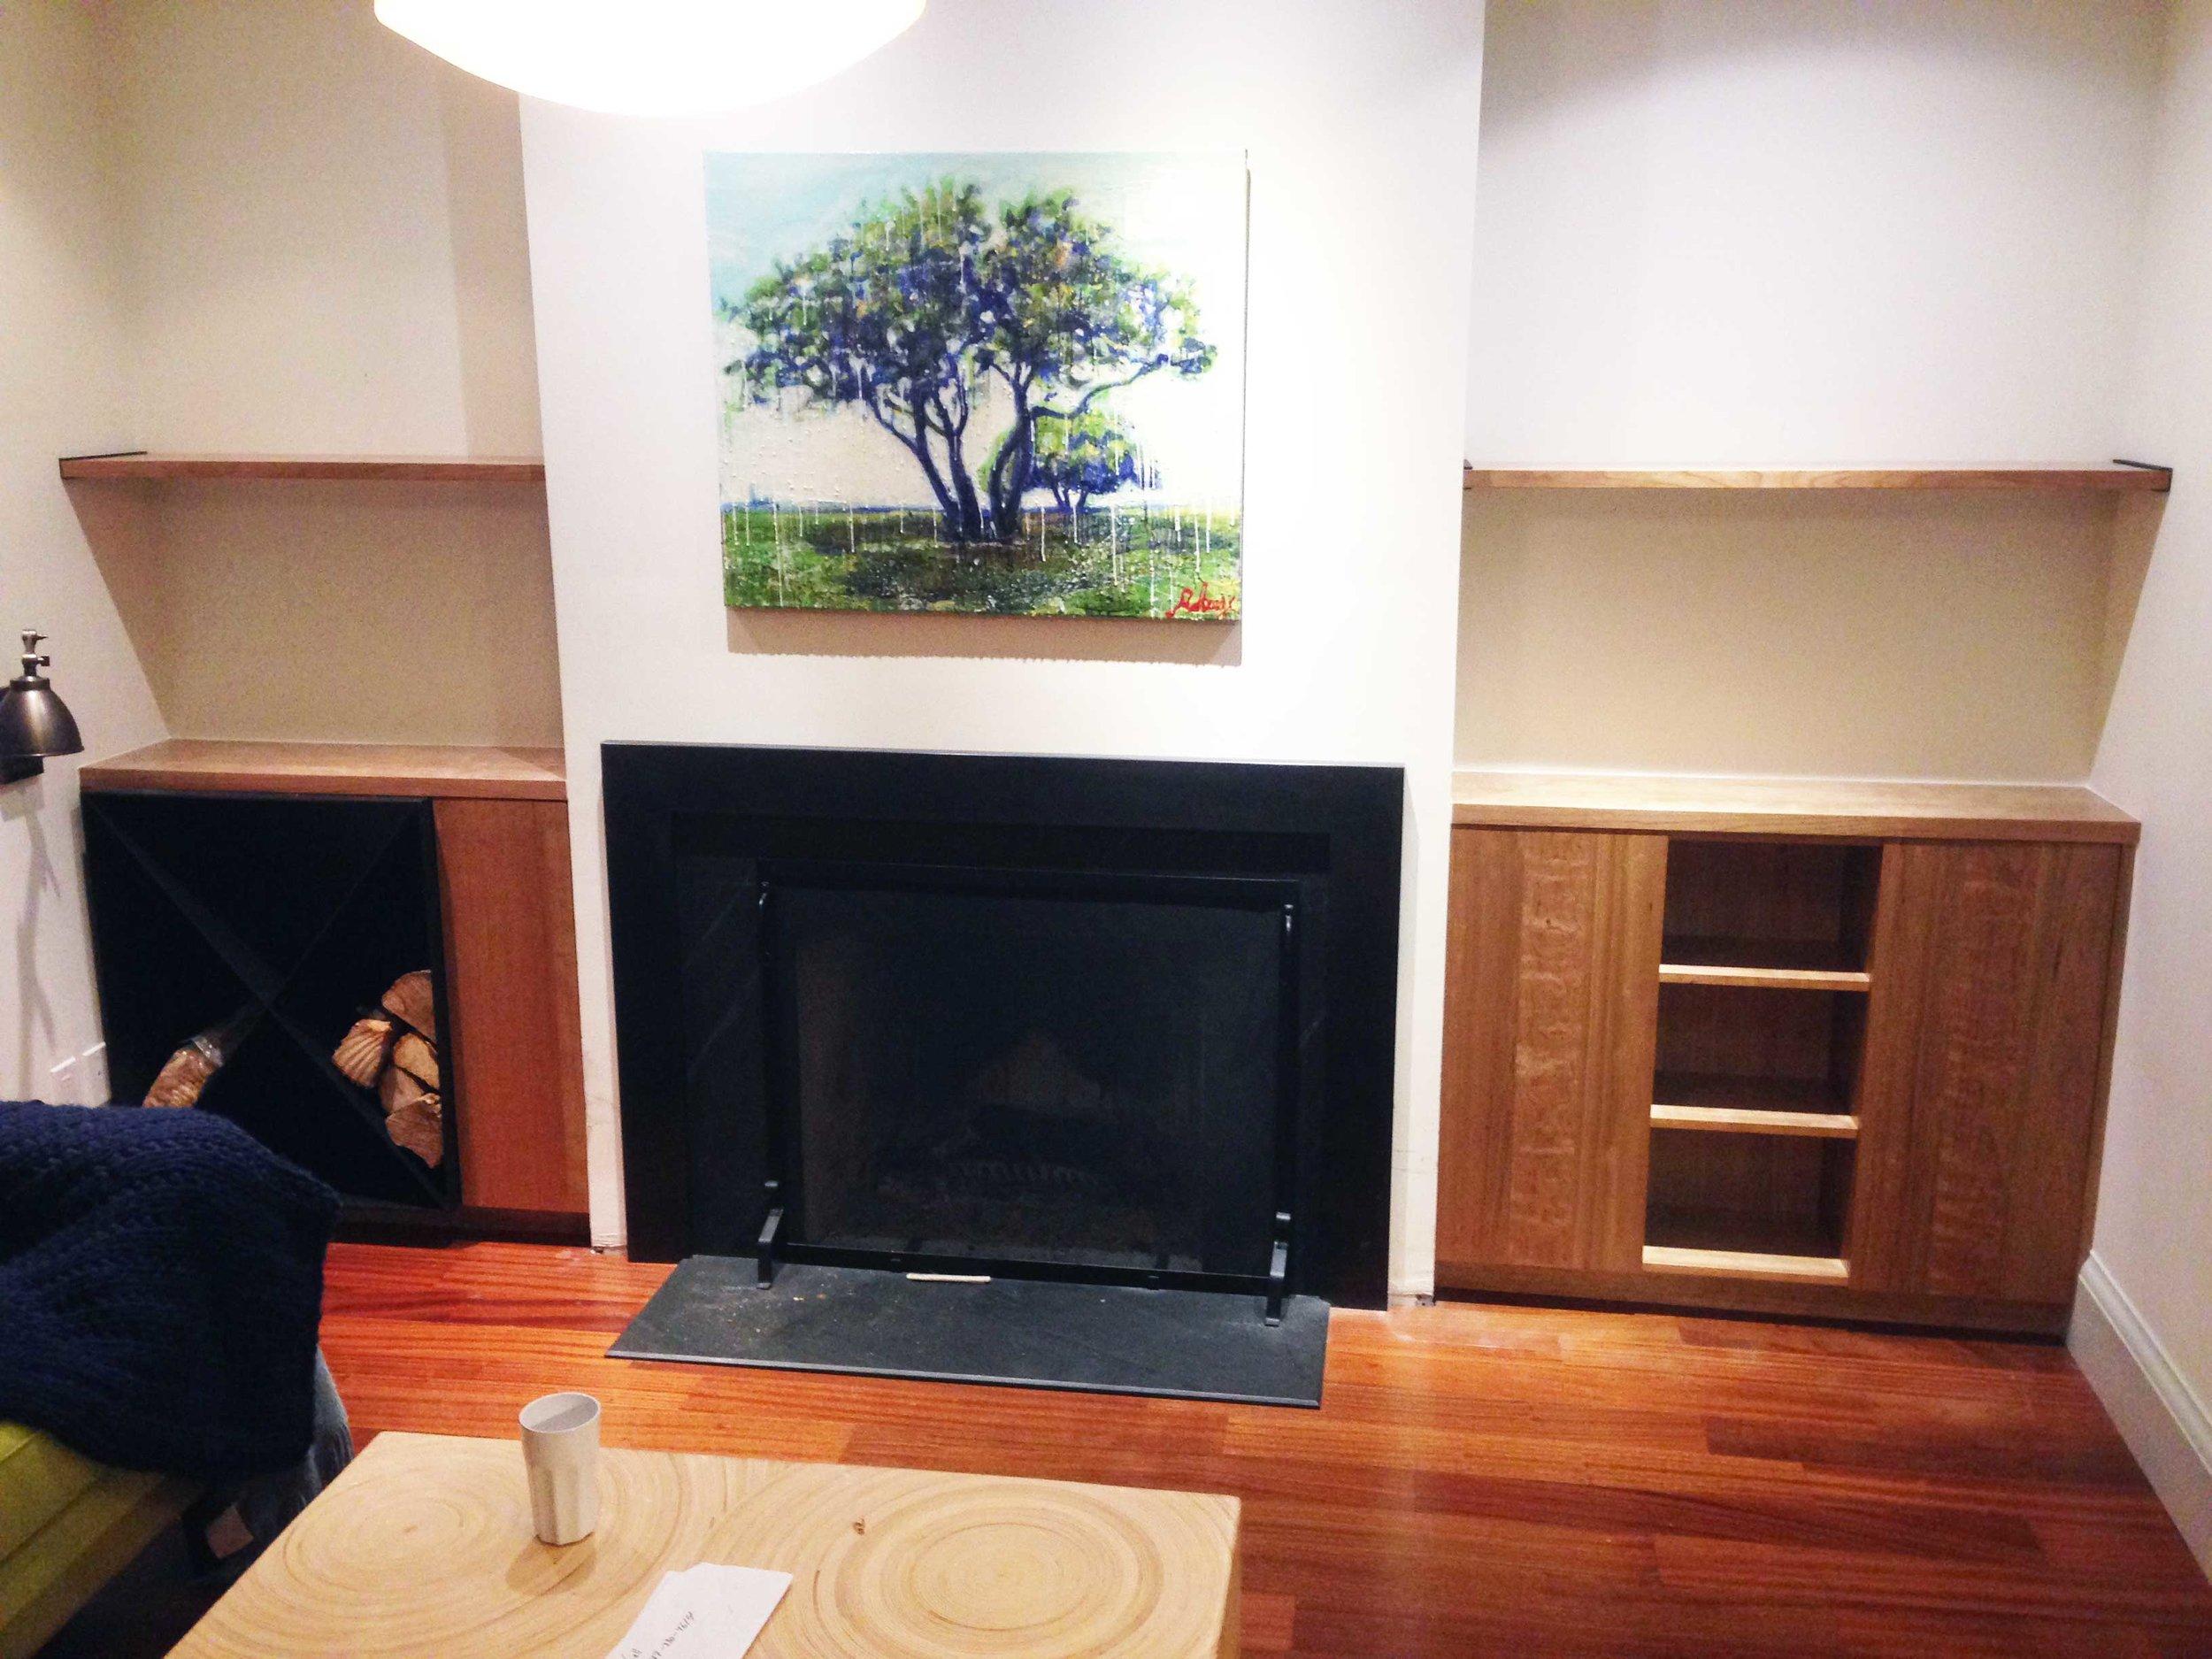 6_FireplaceBuiltins.jpg